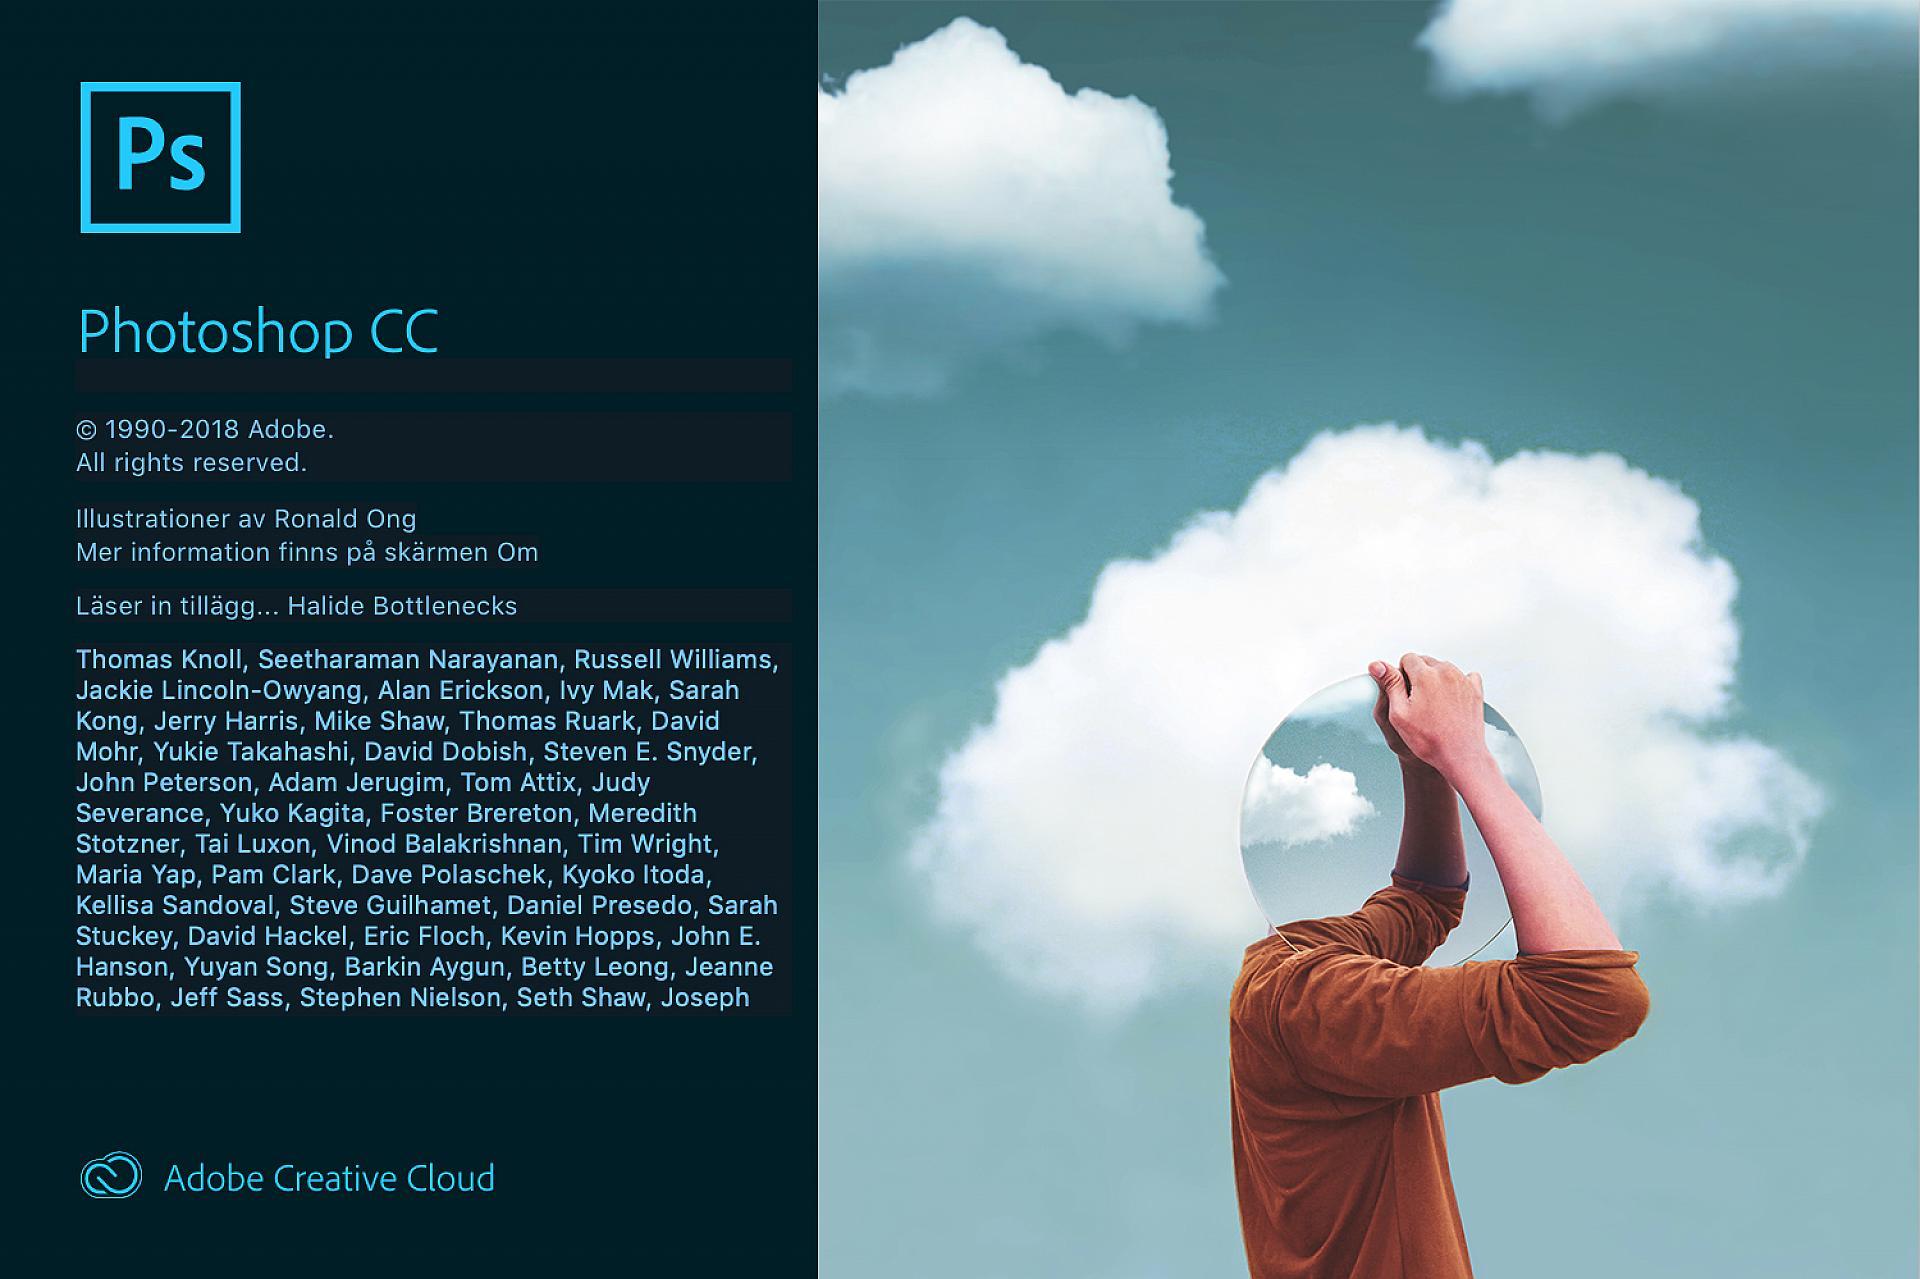 Adobe photoshop cc 2020 crack dll file